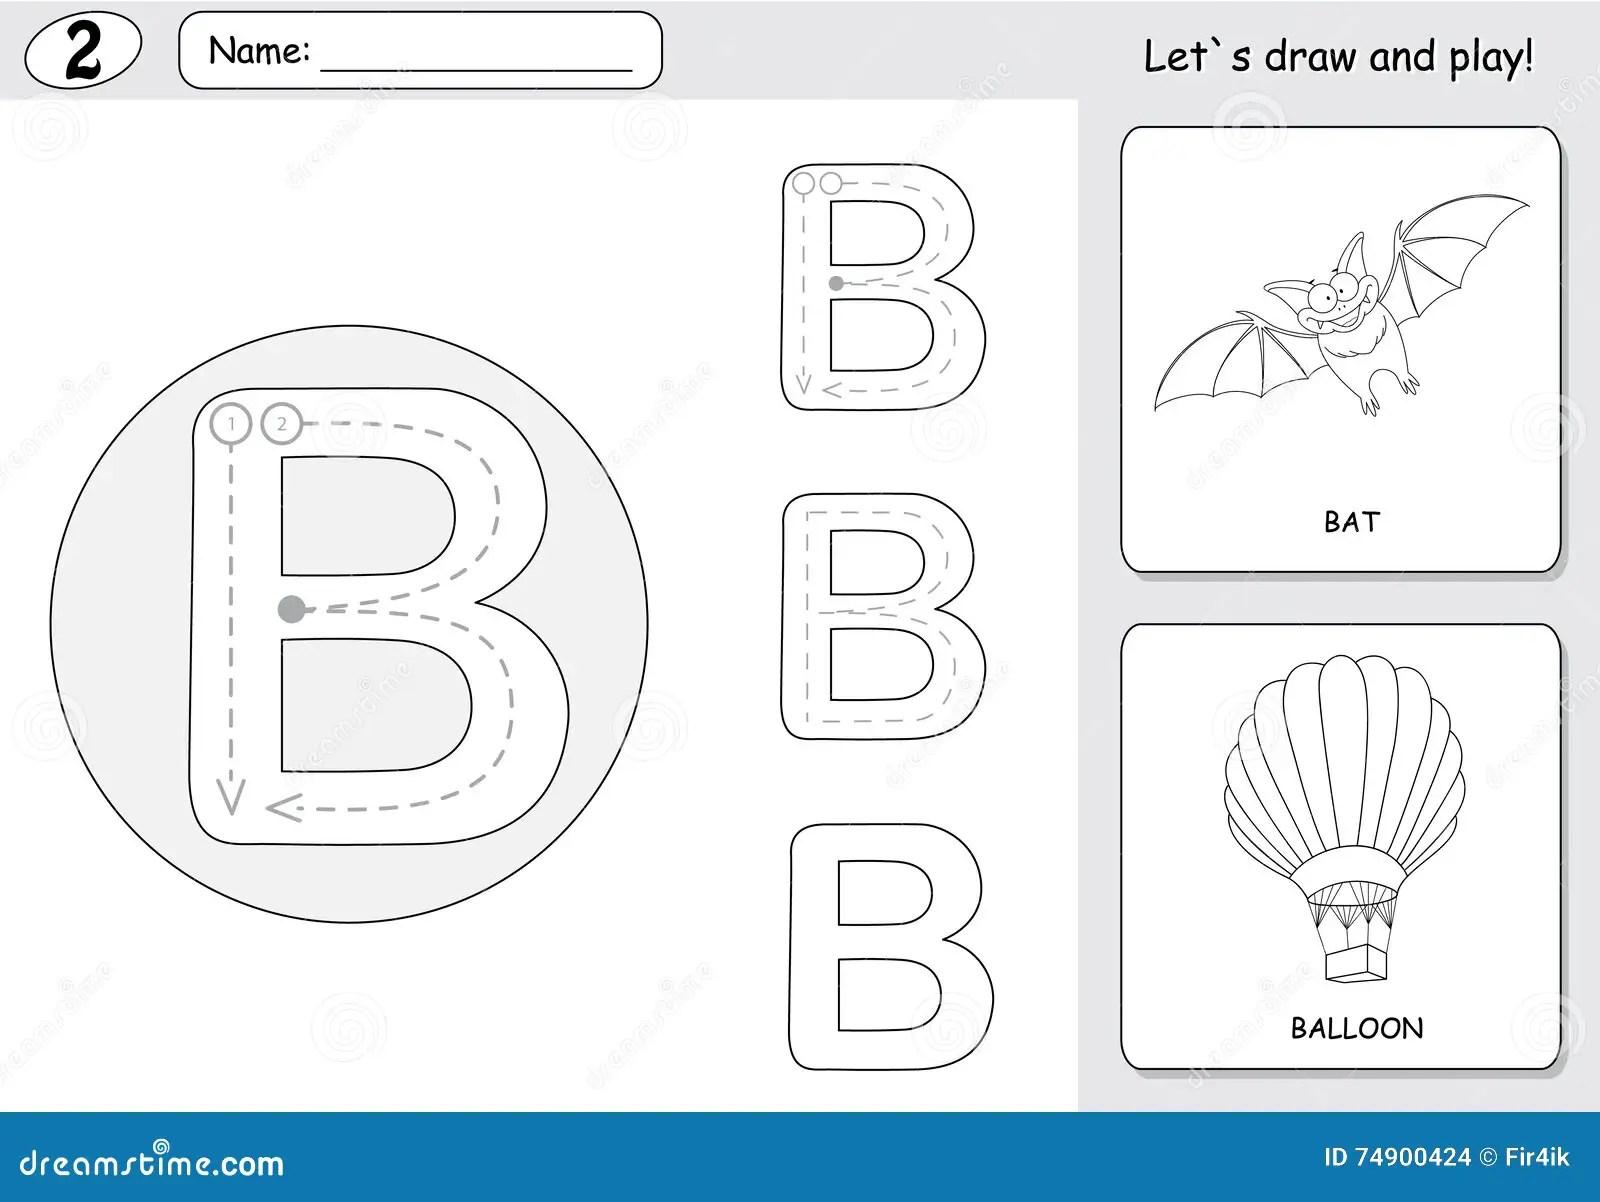 Cartoon Bat And Balloon Alphabet Tracing Worksheet